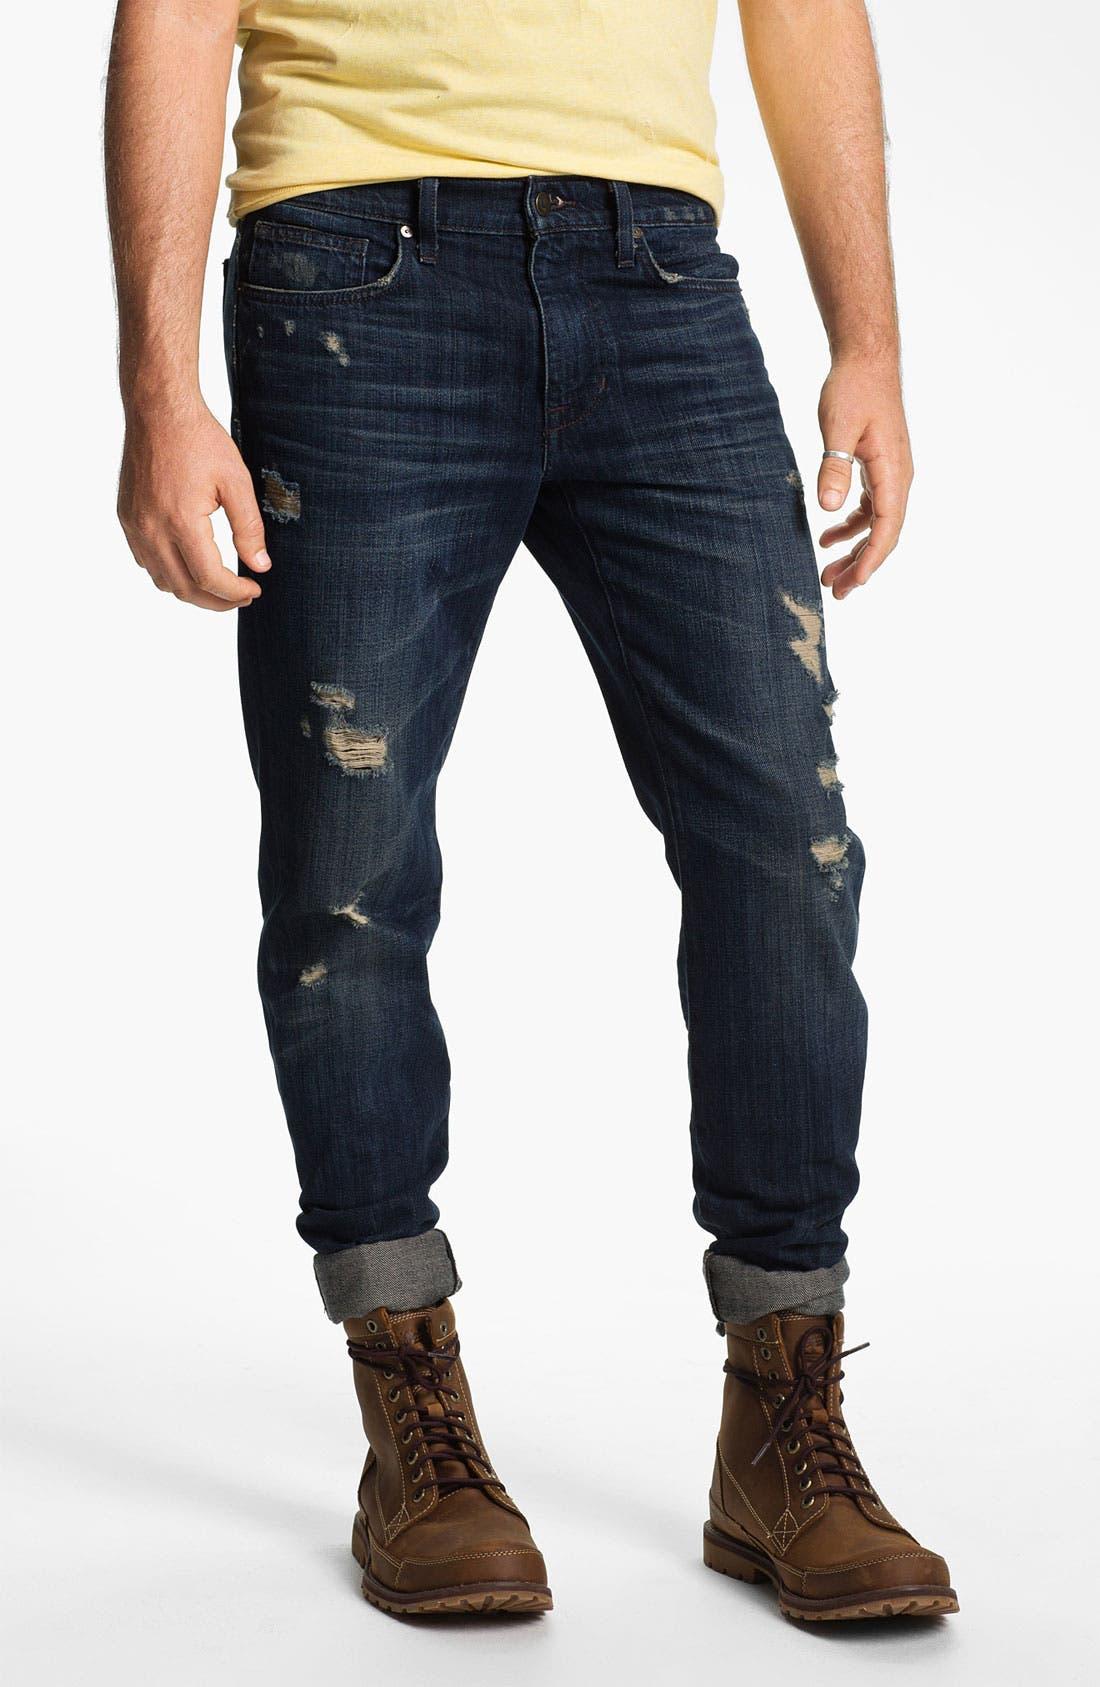 Alternate Image 1 Selected - Joe's 'Brixton' Slim Straight Leg Jeans (Macer)